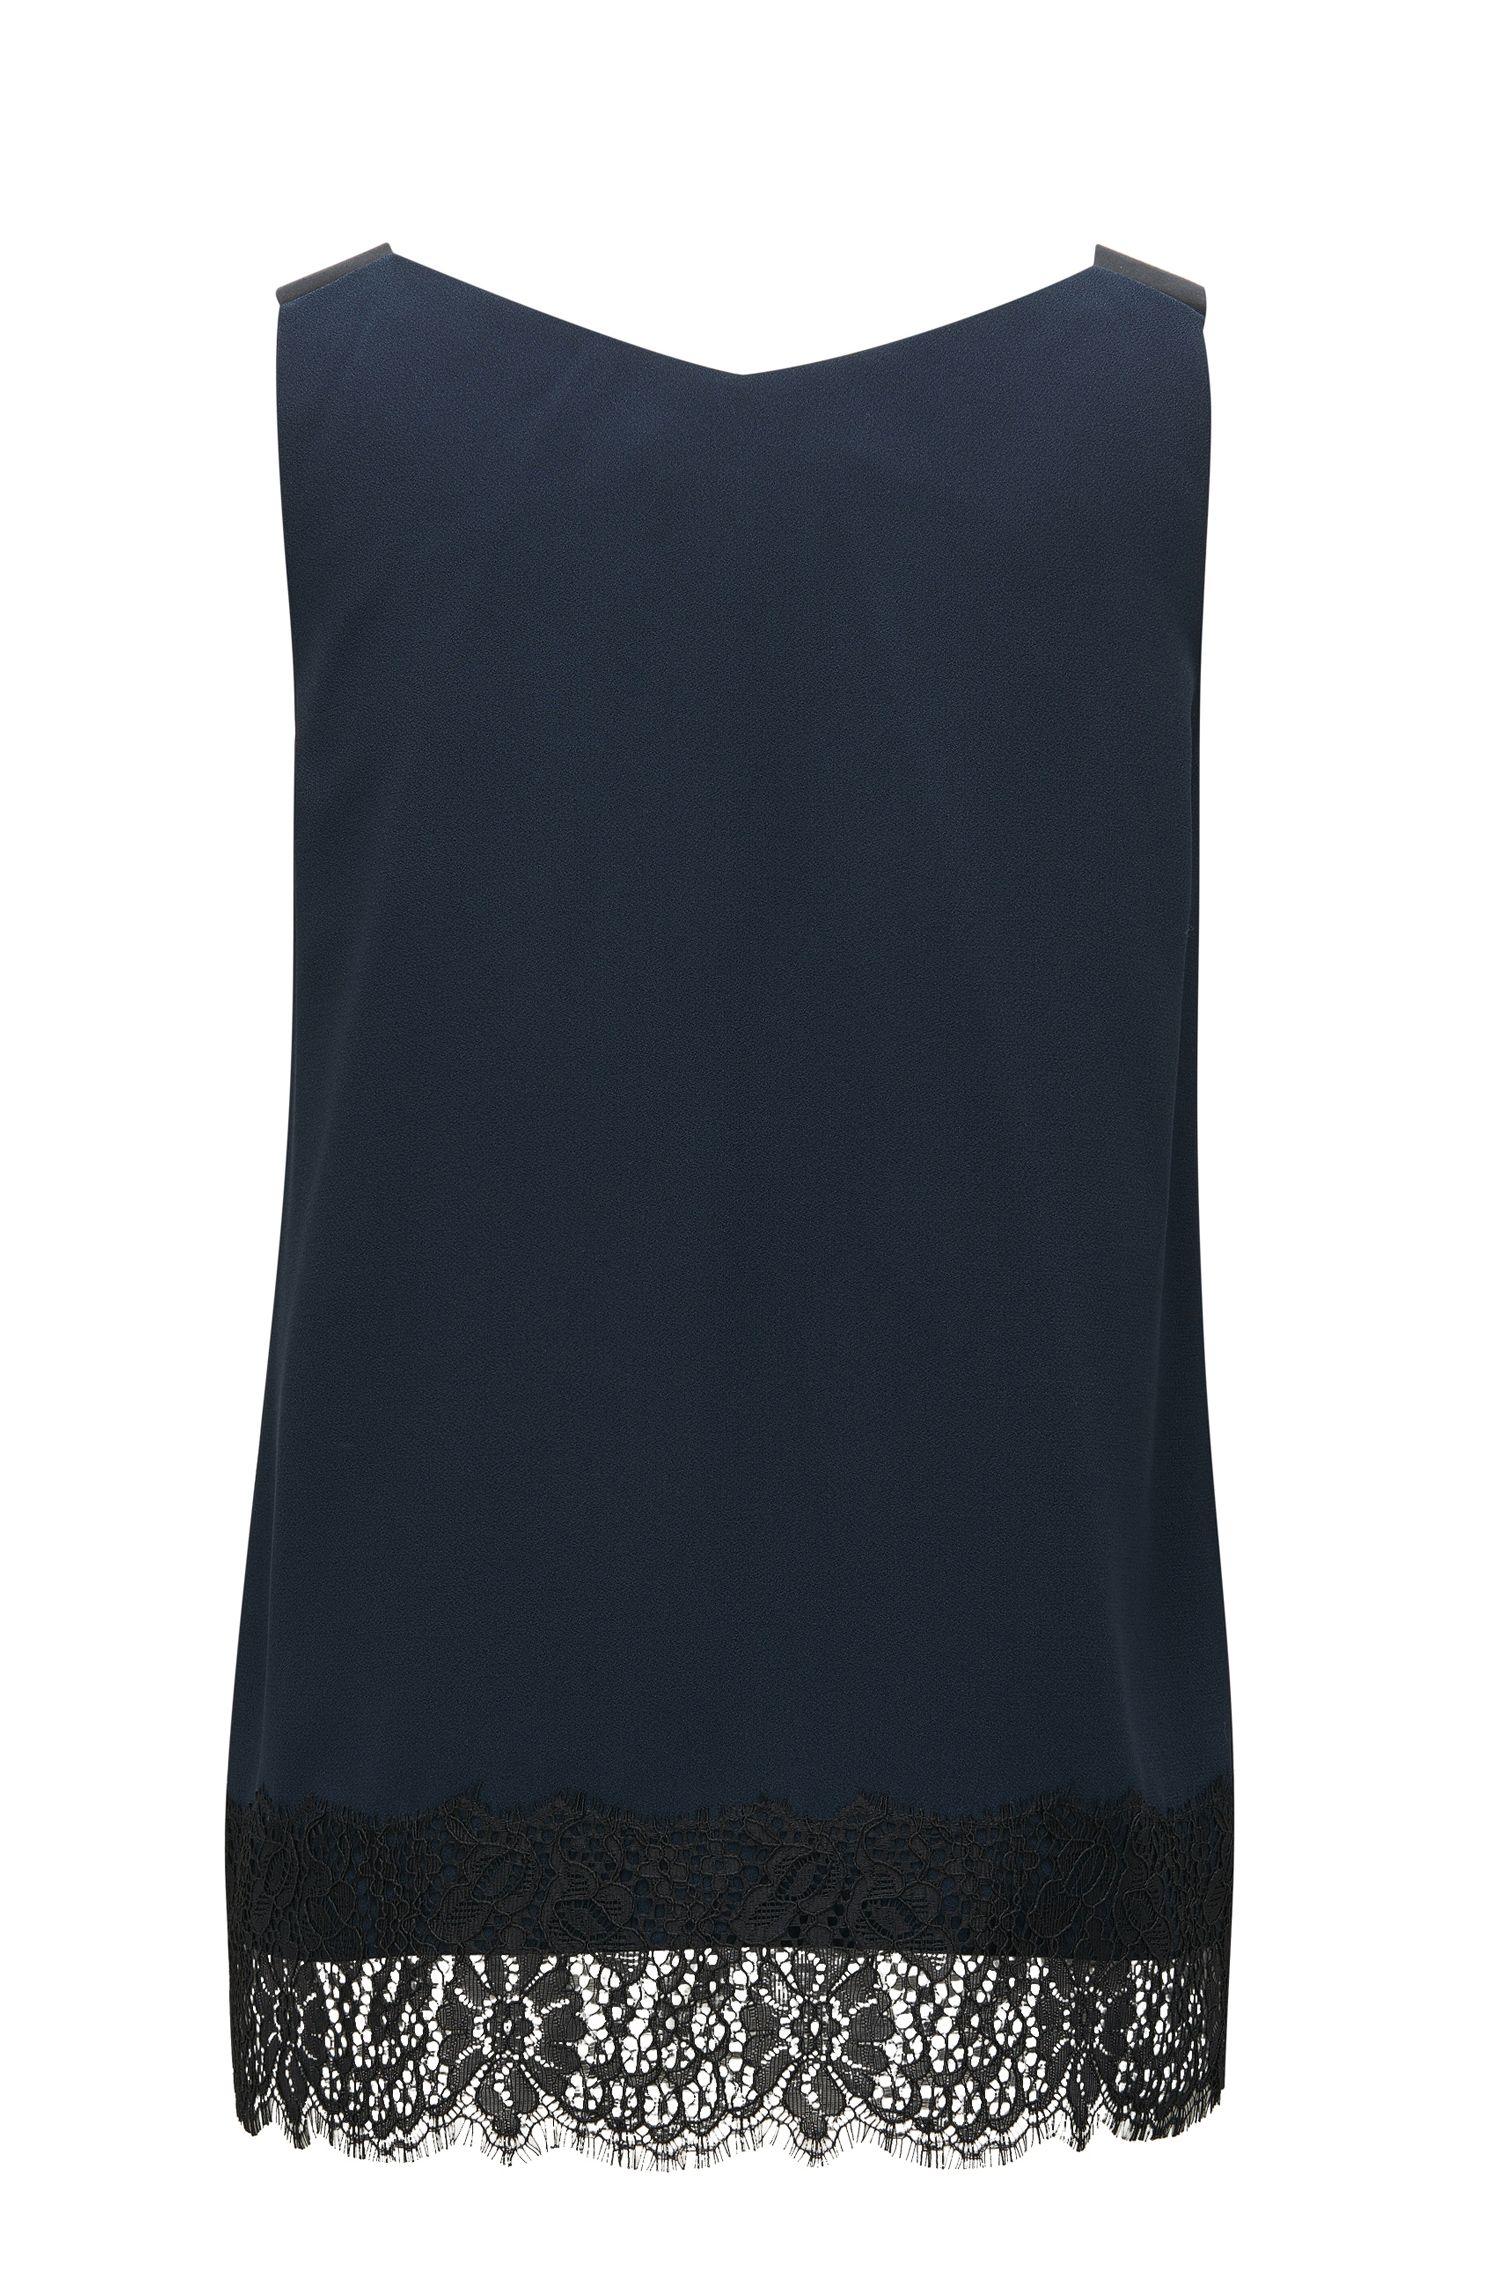 Laced Crepe Sleeveless Top | Iminka